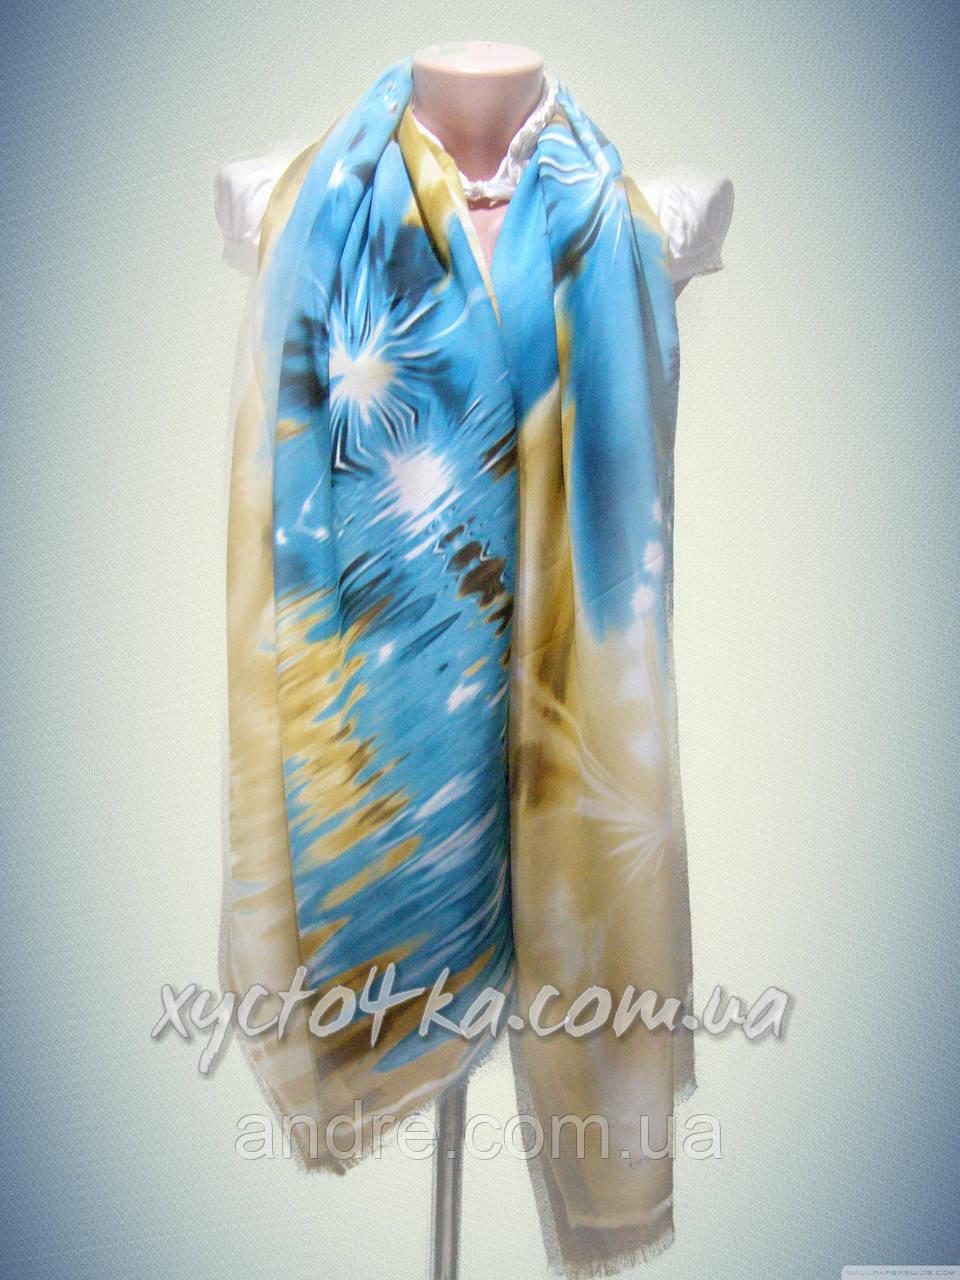 Турецкие шарфы палантины Течение, бирюза